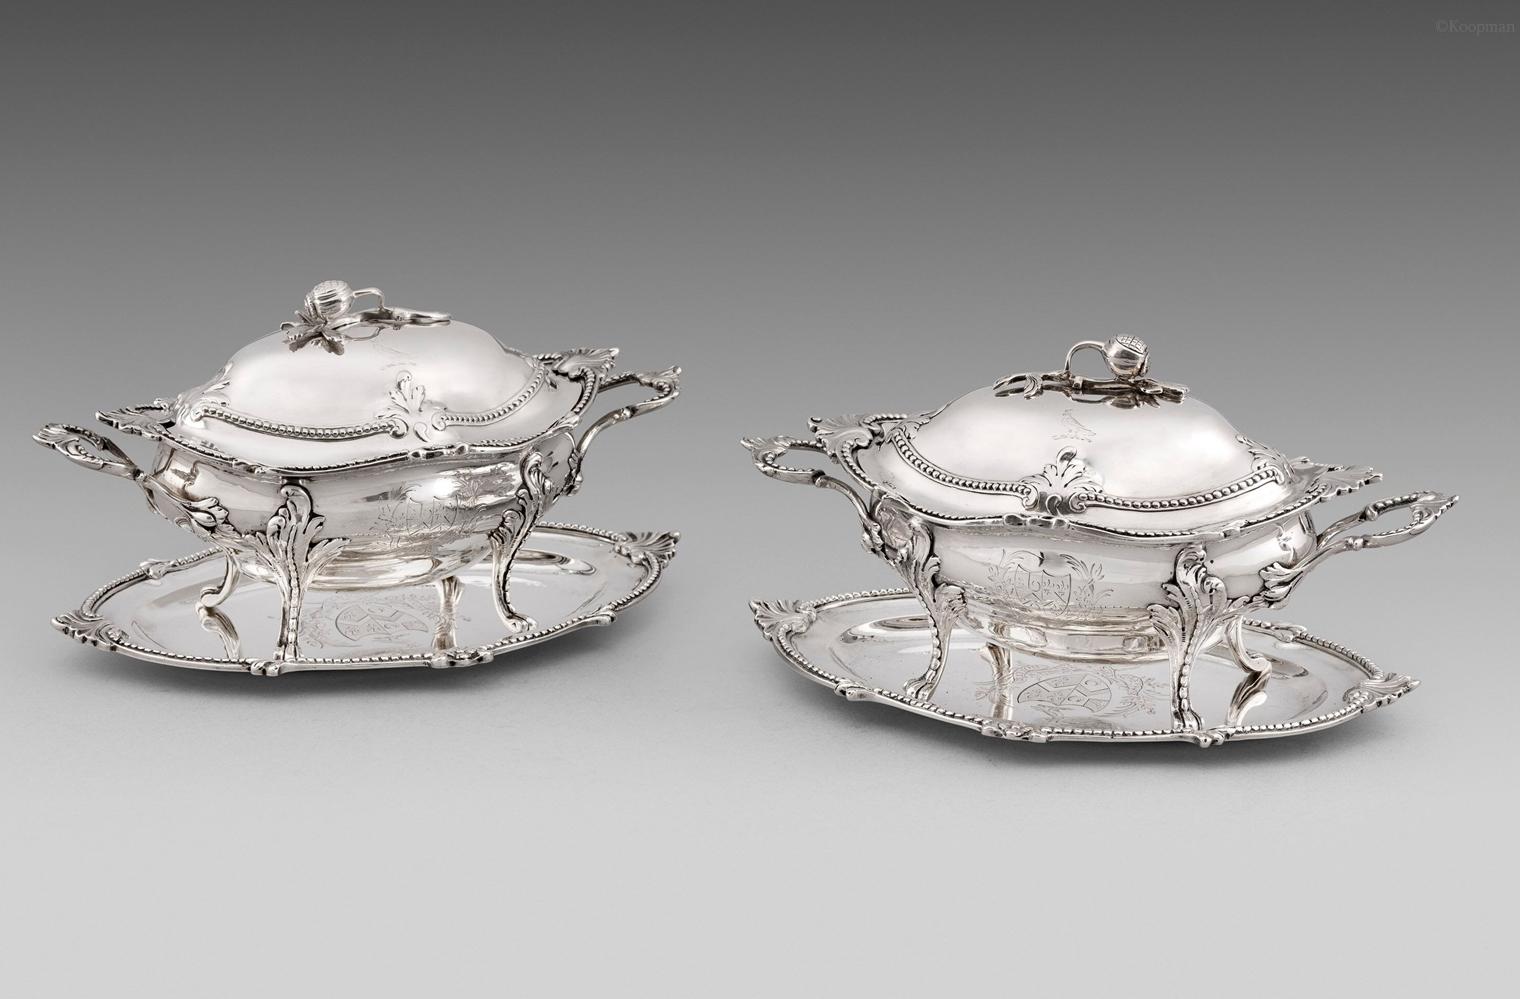 A Pair of George III Sauce Tureens